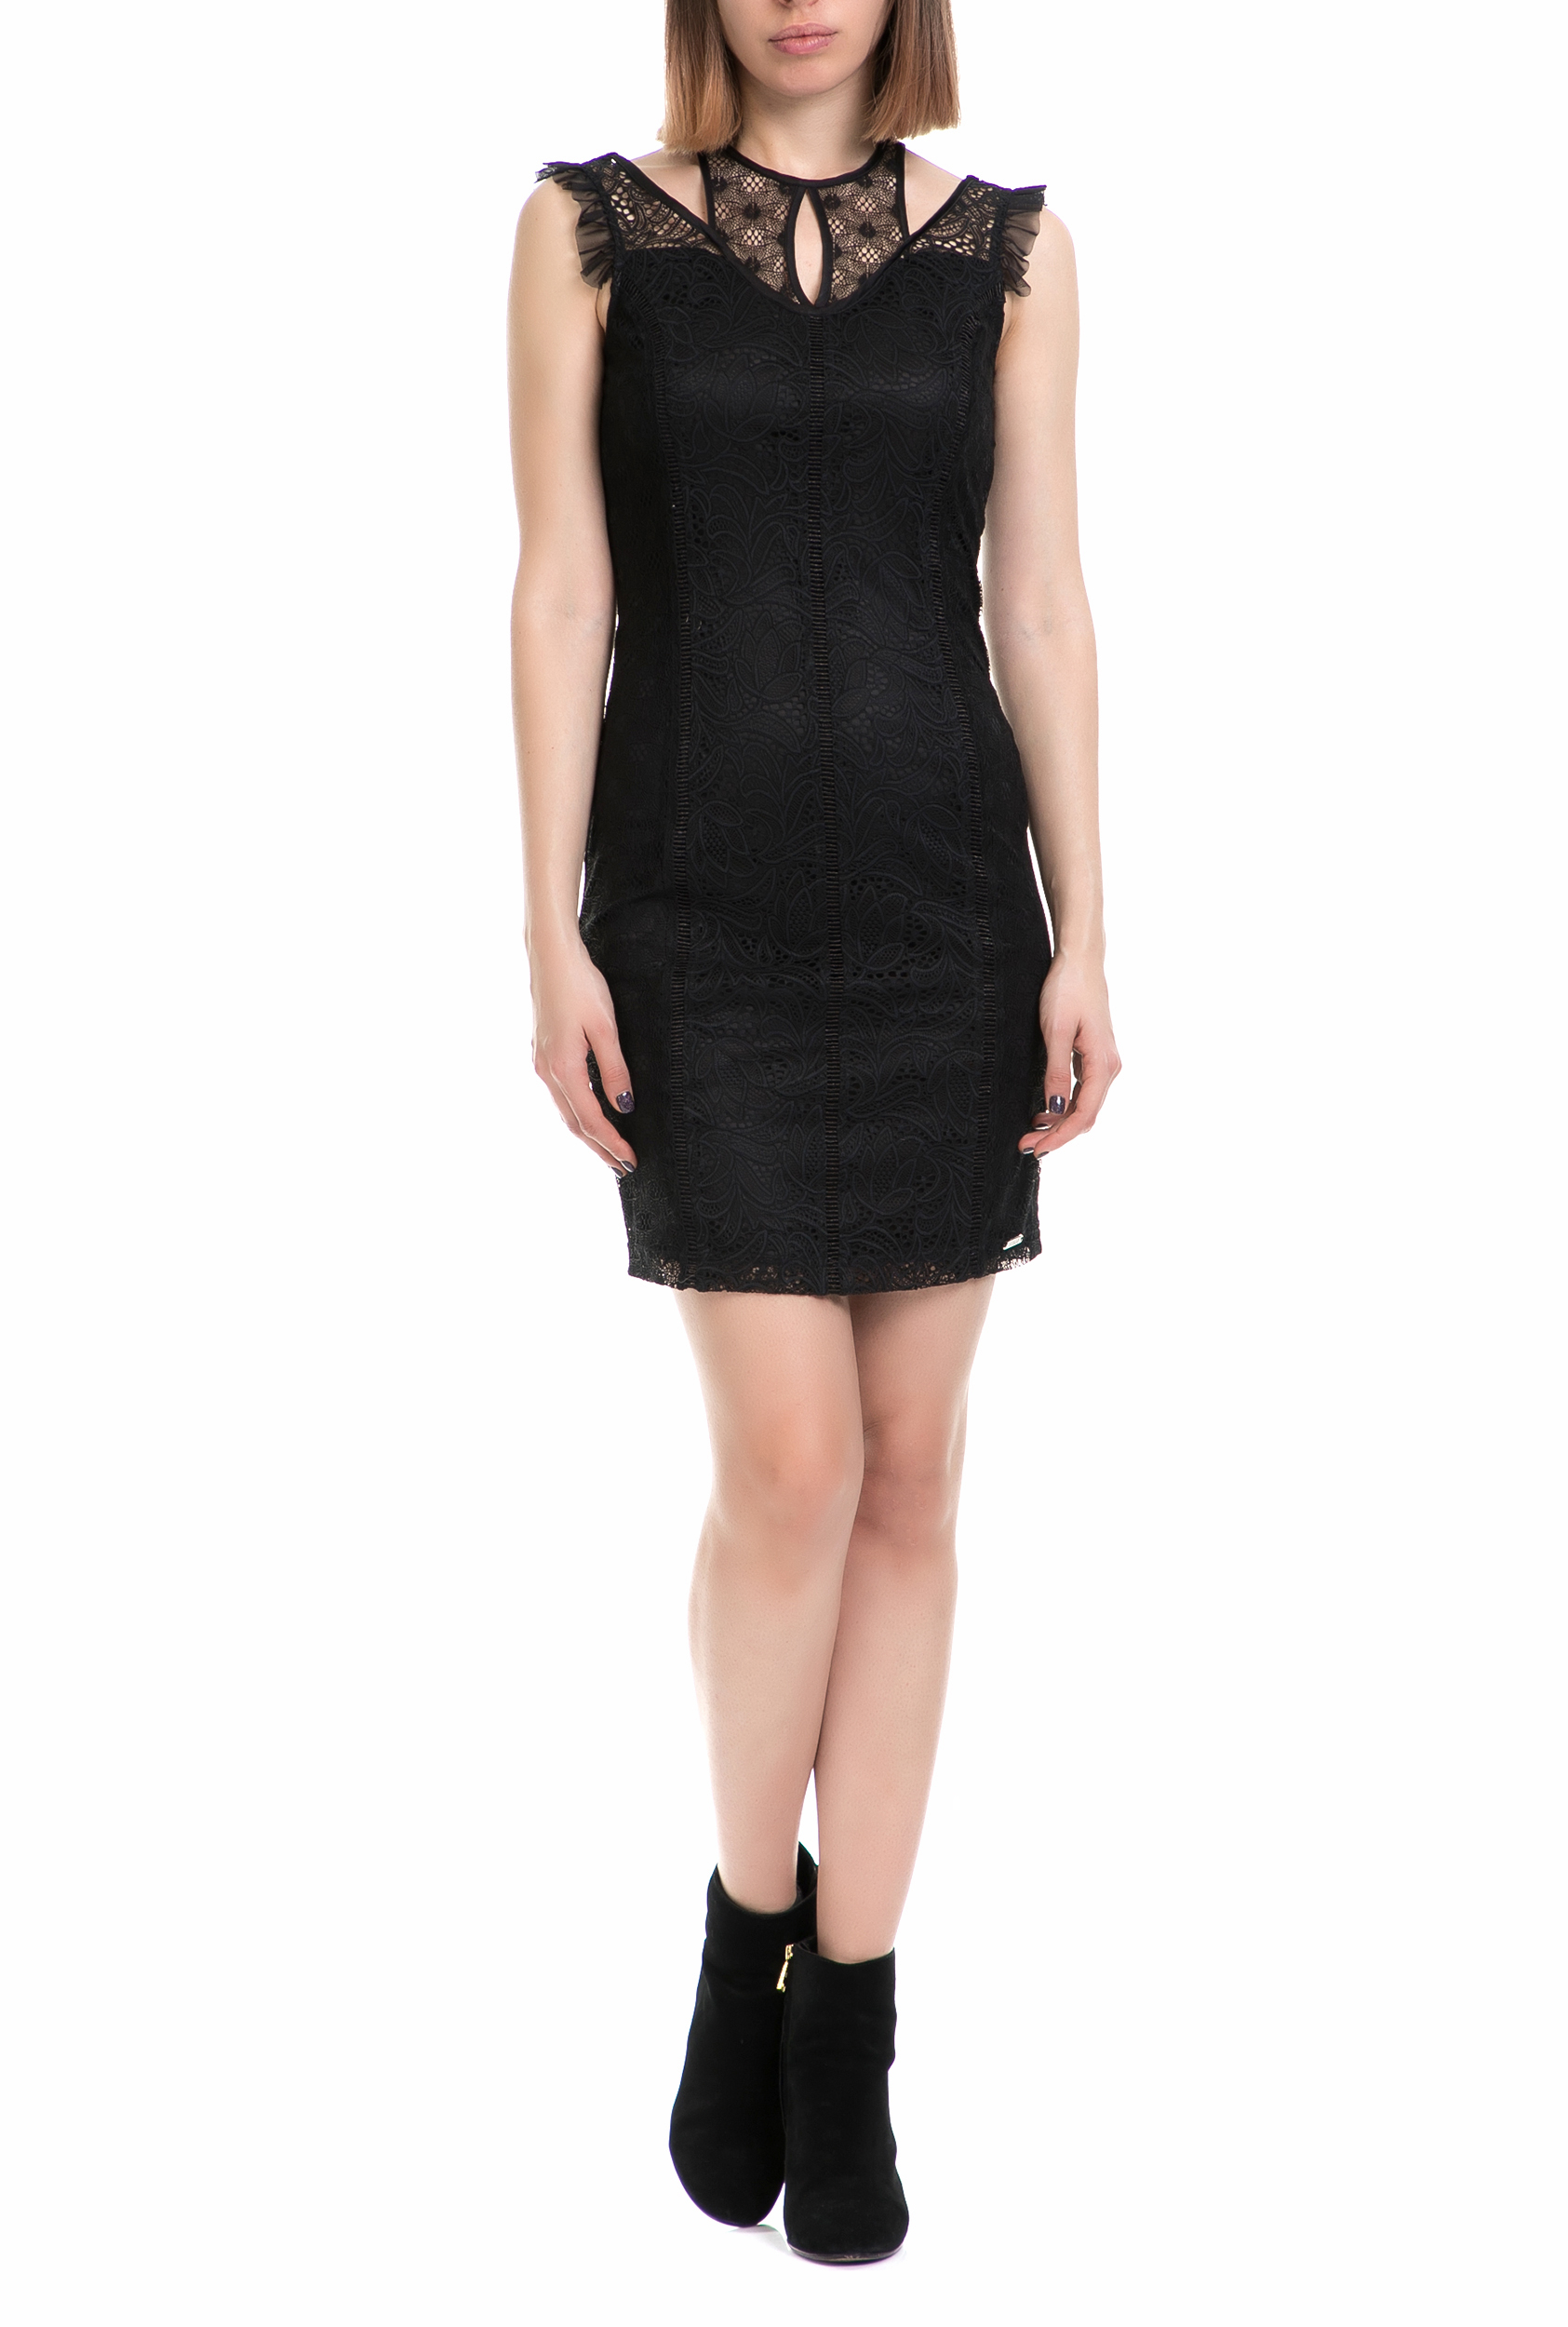 ac0c90c6d38 GrabitApp · GUESS - Γυναικείο μίνι αμάνικο φόρεμα Guess μαύρο από δαντέλα